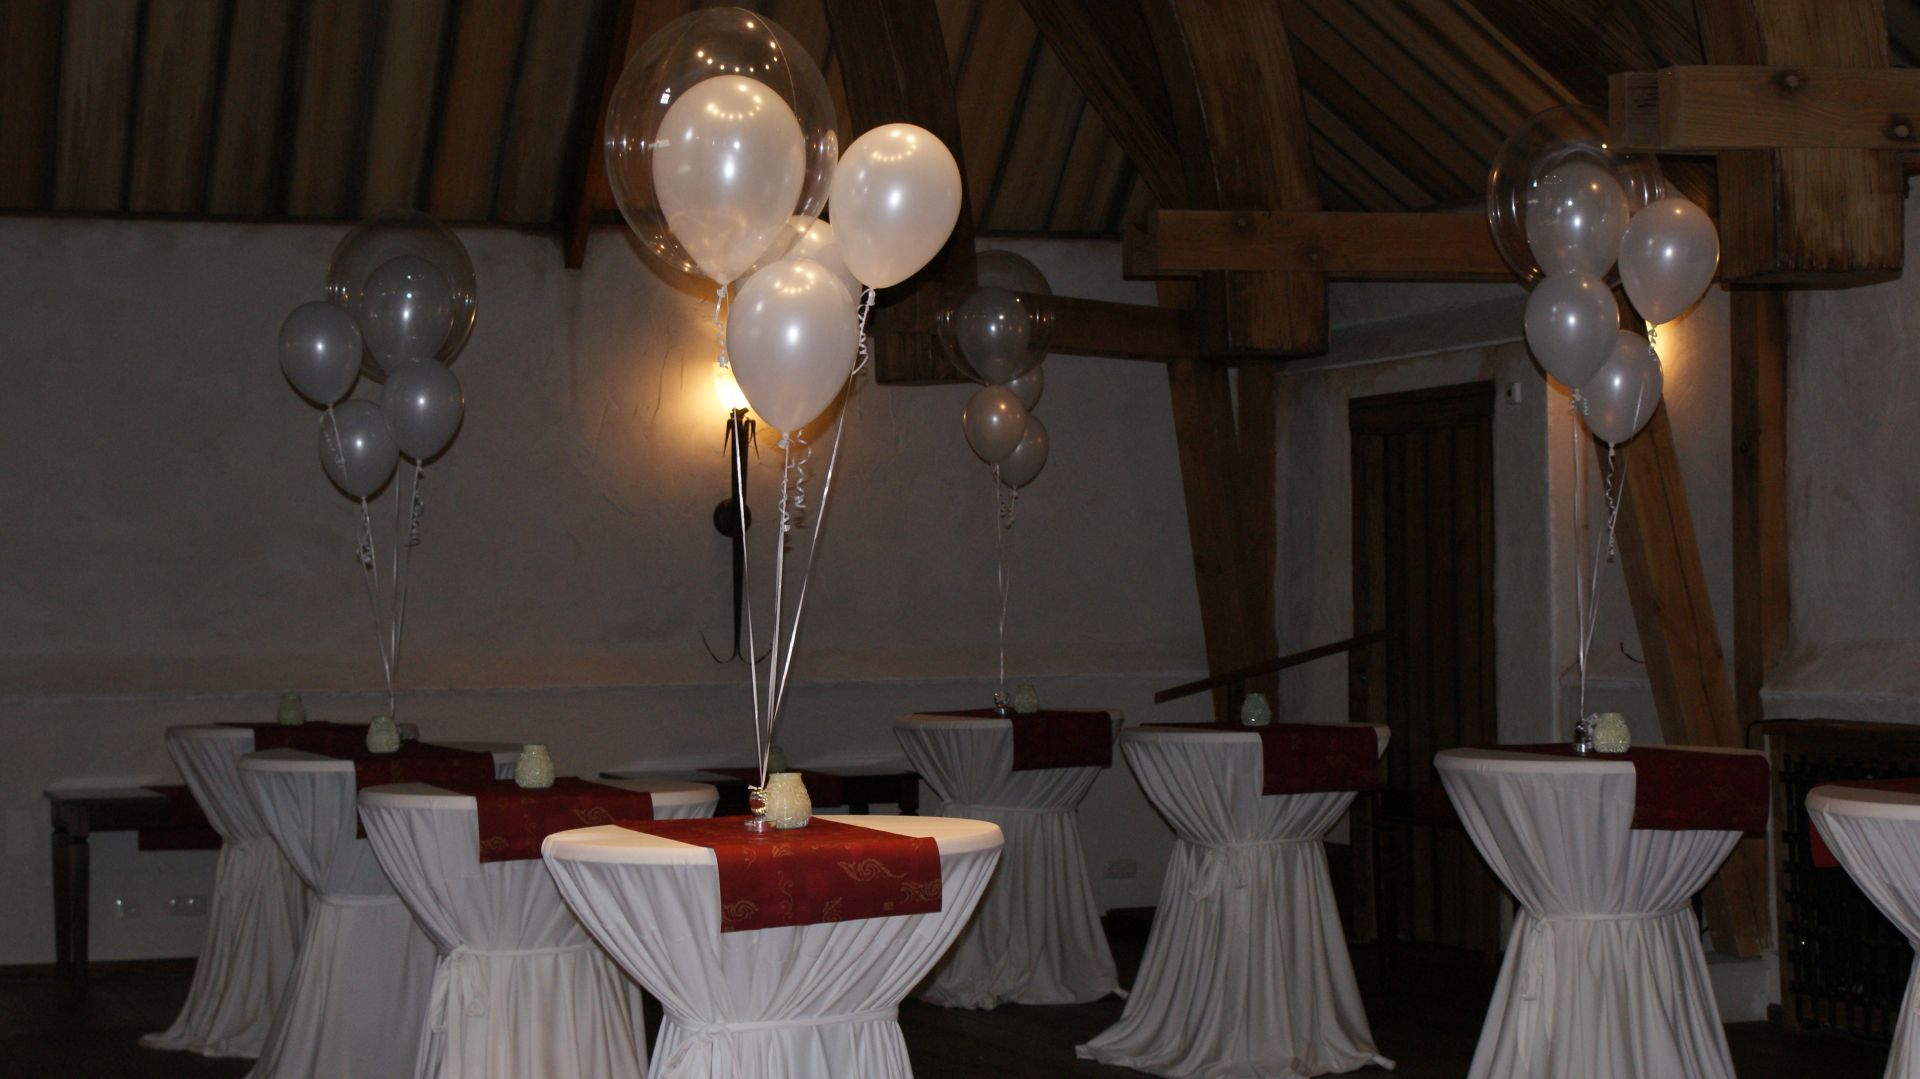 Tafeldecoratie van 3 ballonnen